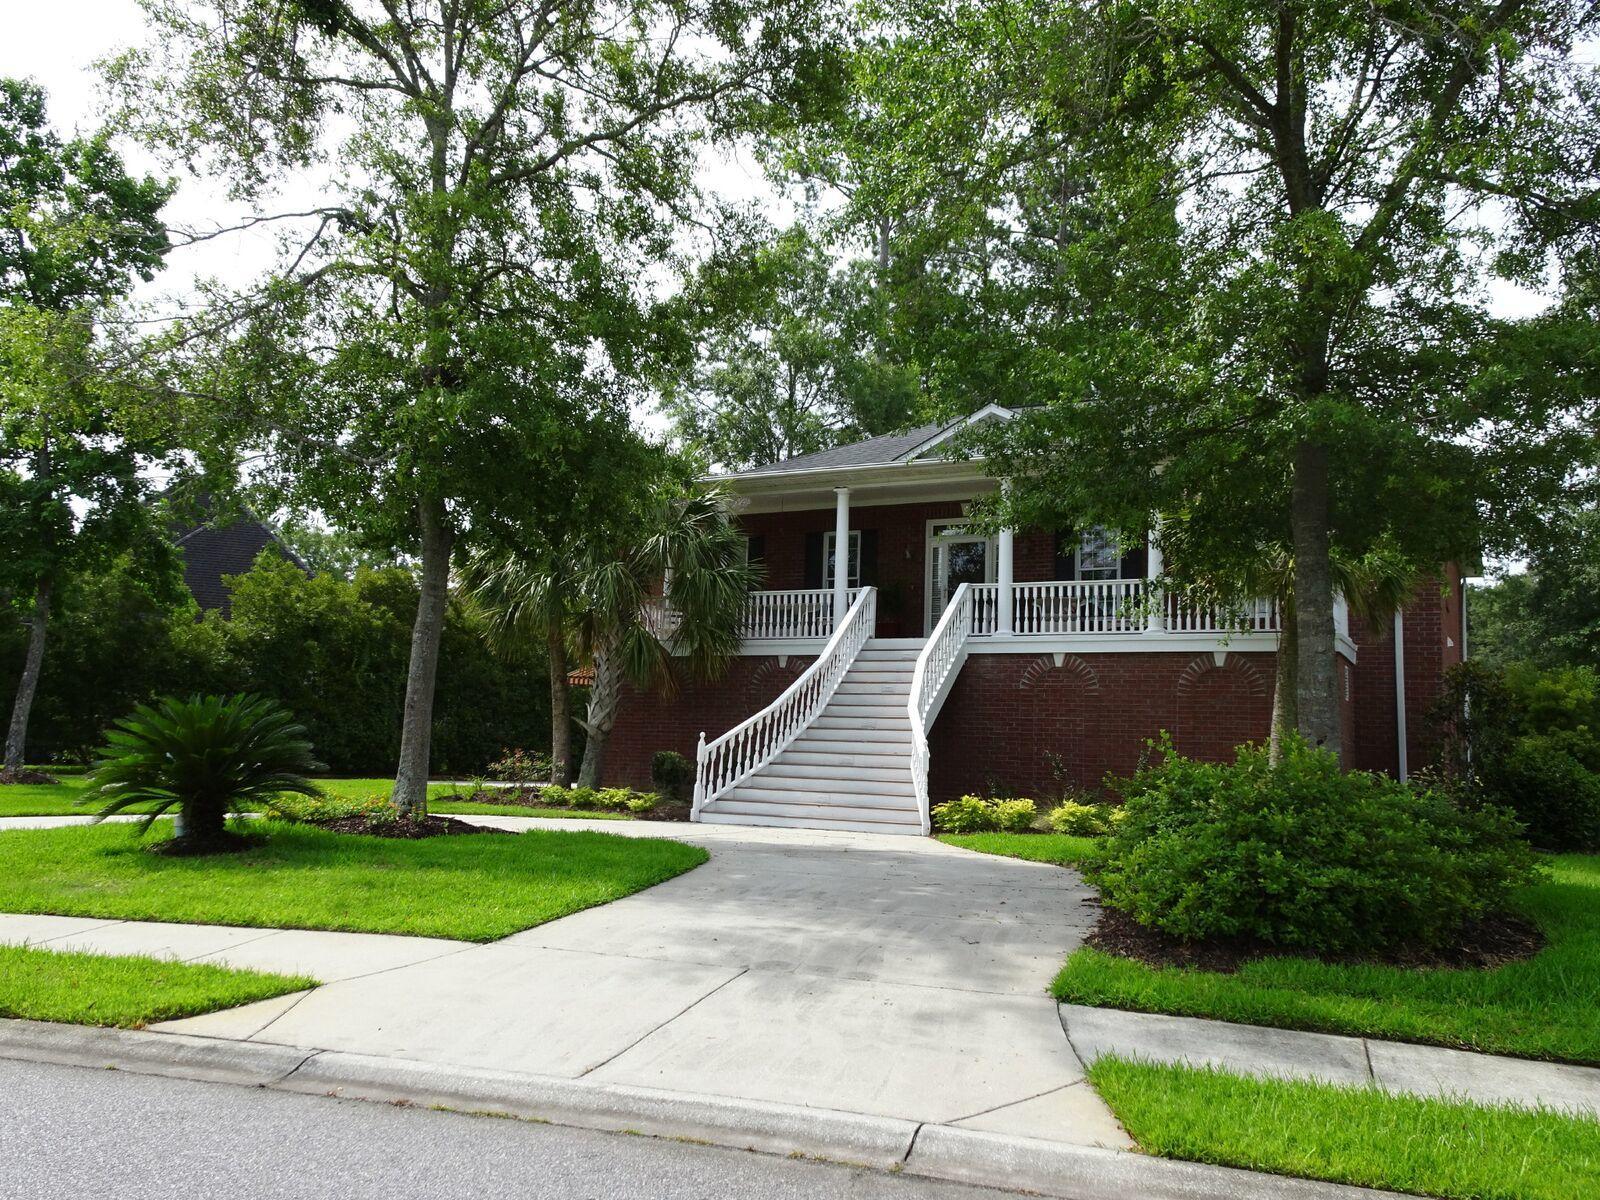 Photo of 8923 E Fairway Woods Dr, North Charleston, SC 29420